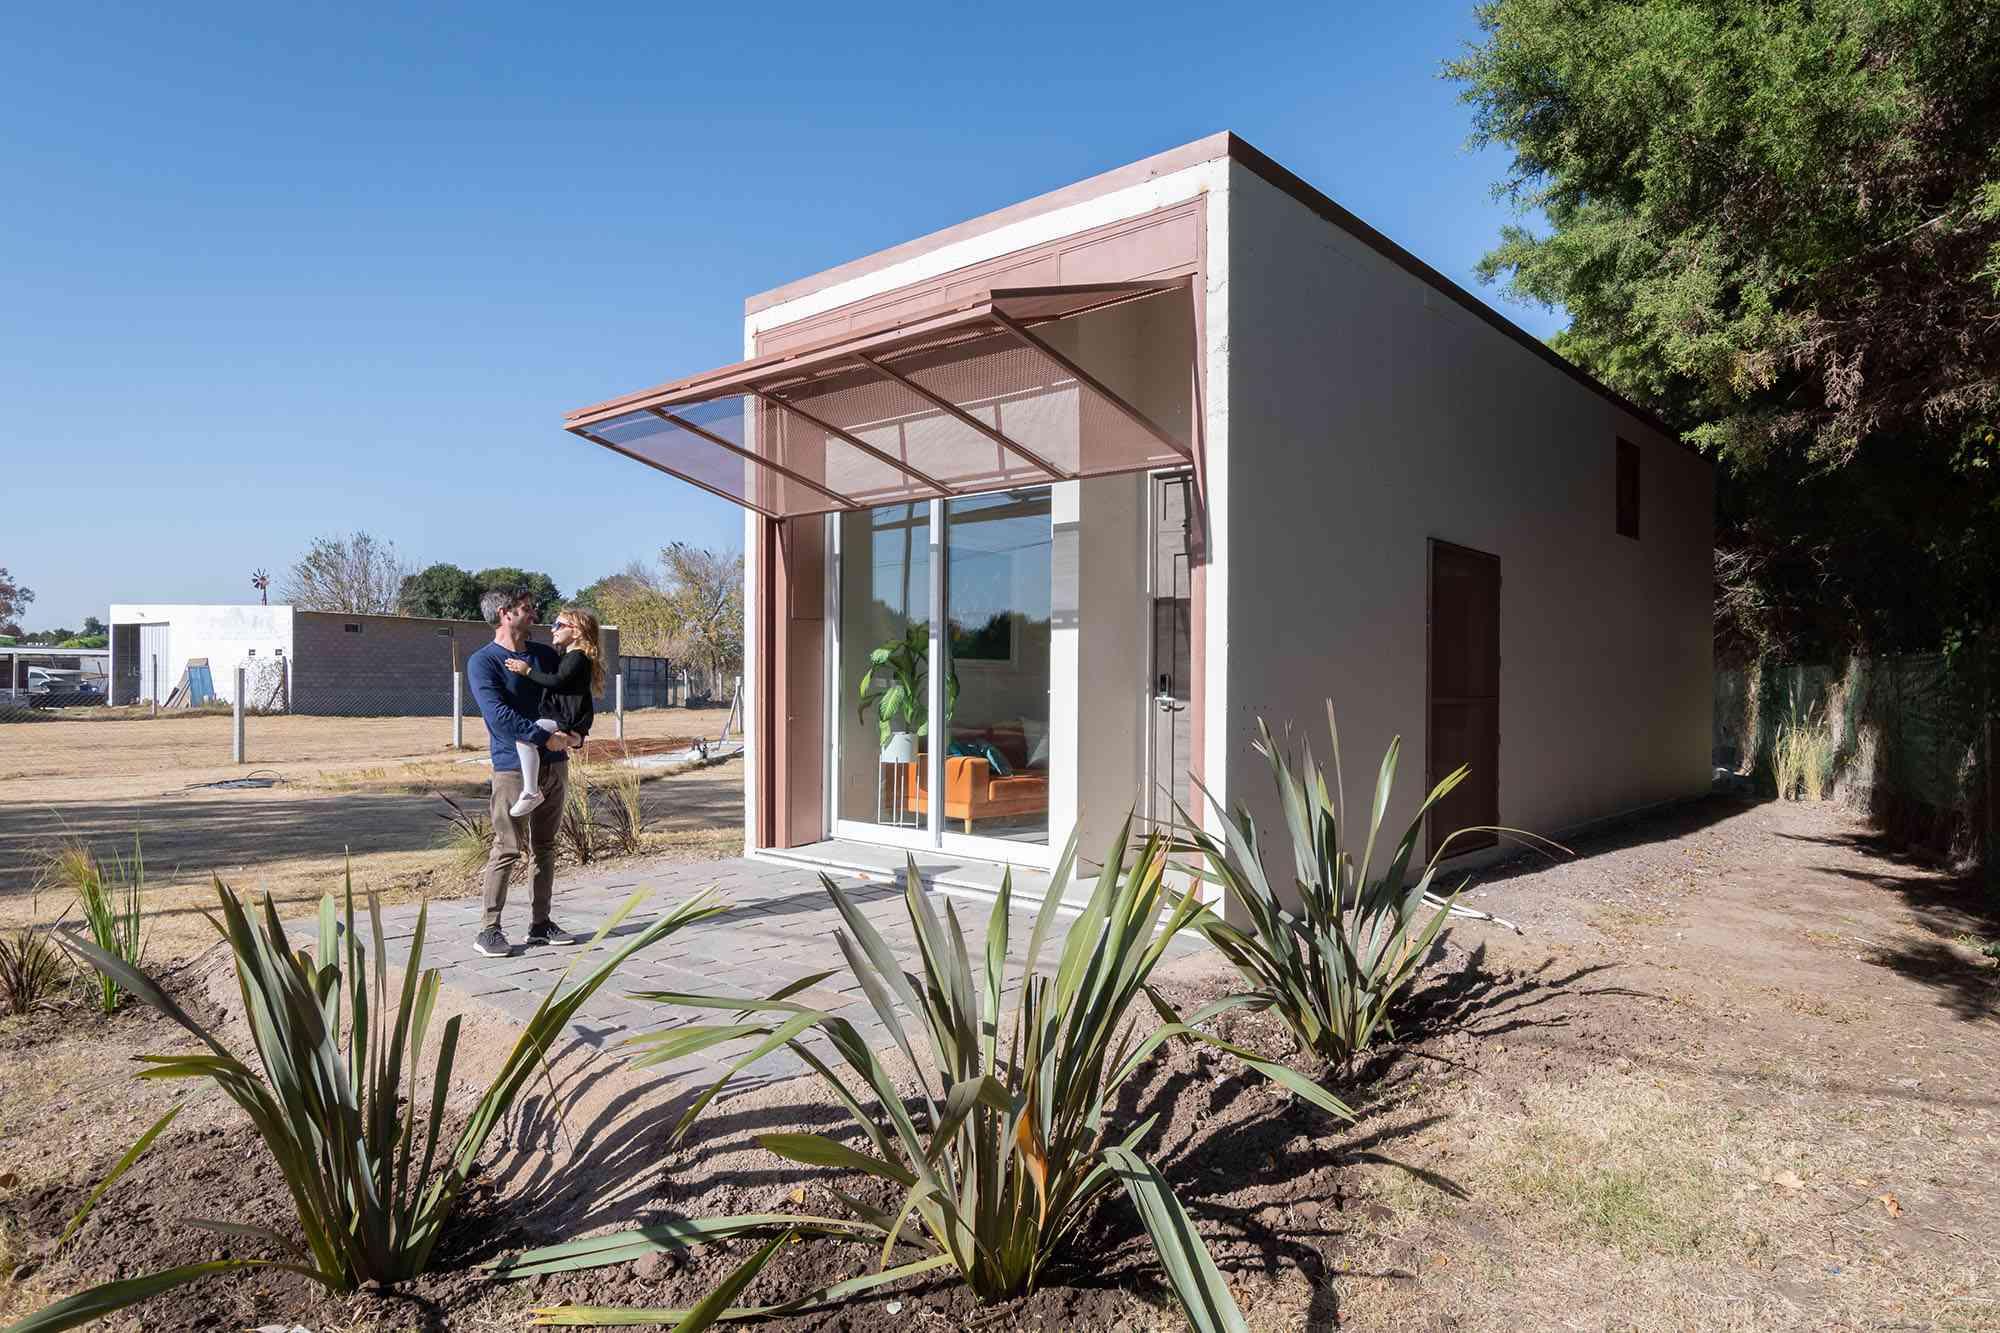 Hüga prefabricated house by Grandio exterior